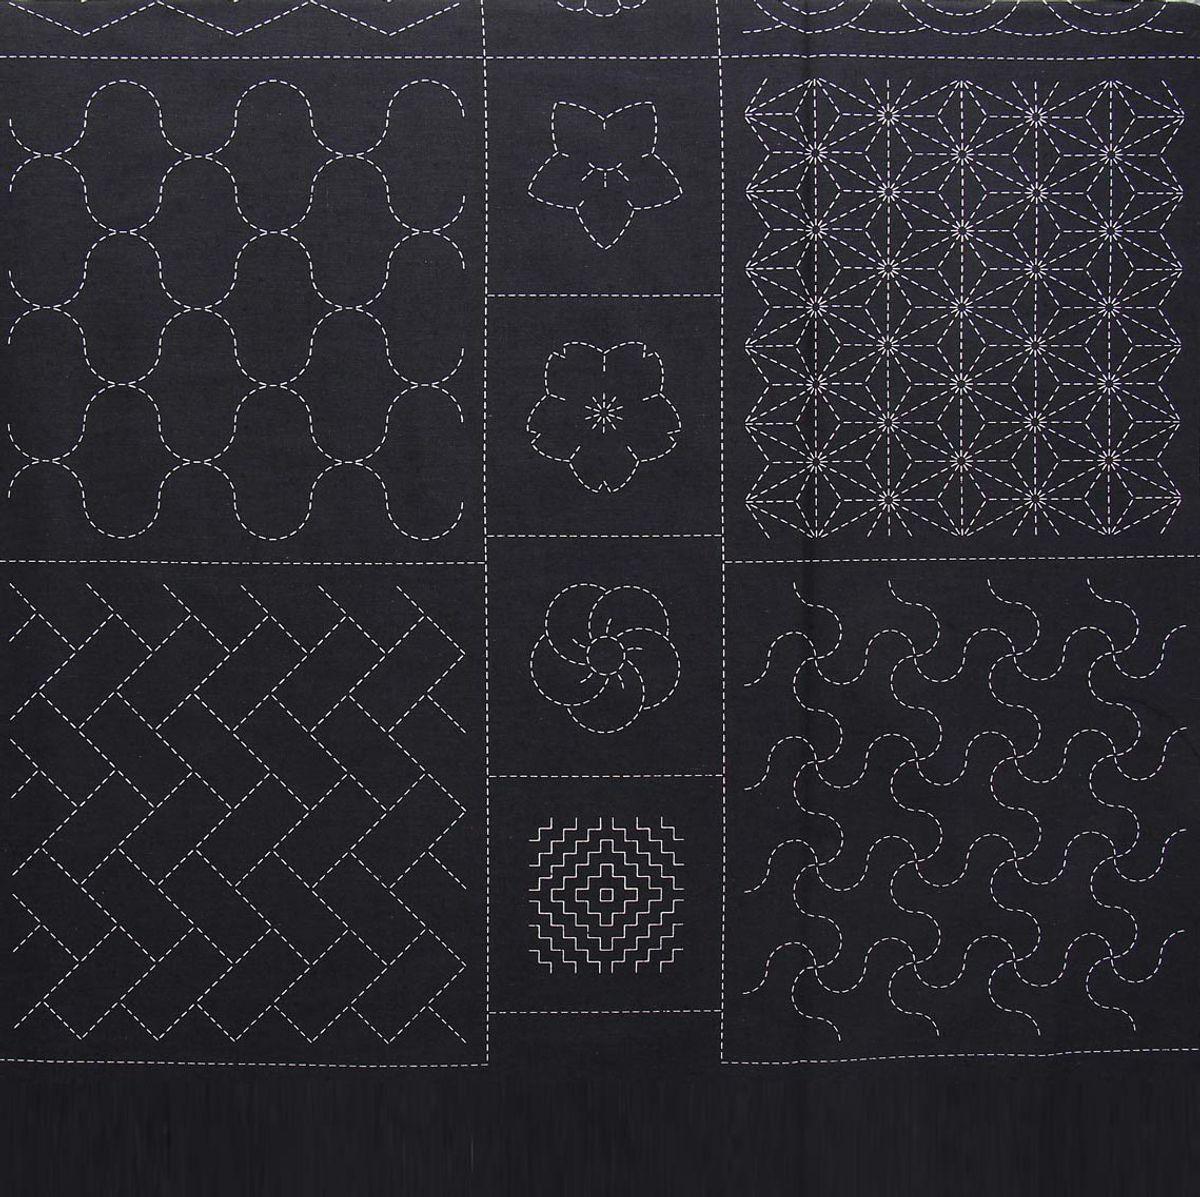 Panneau de tissu coton sashiko imprimé Olympus - Noir